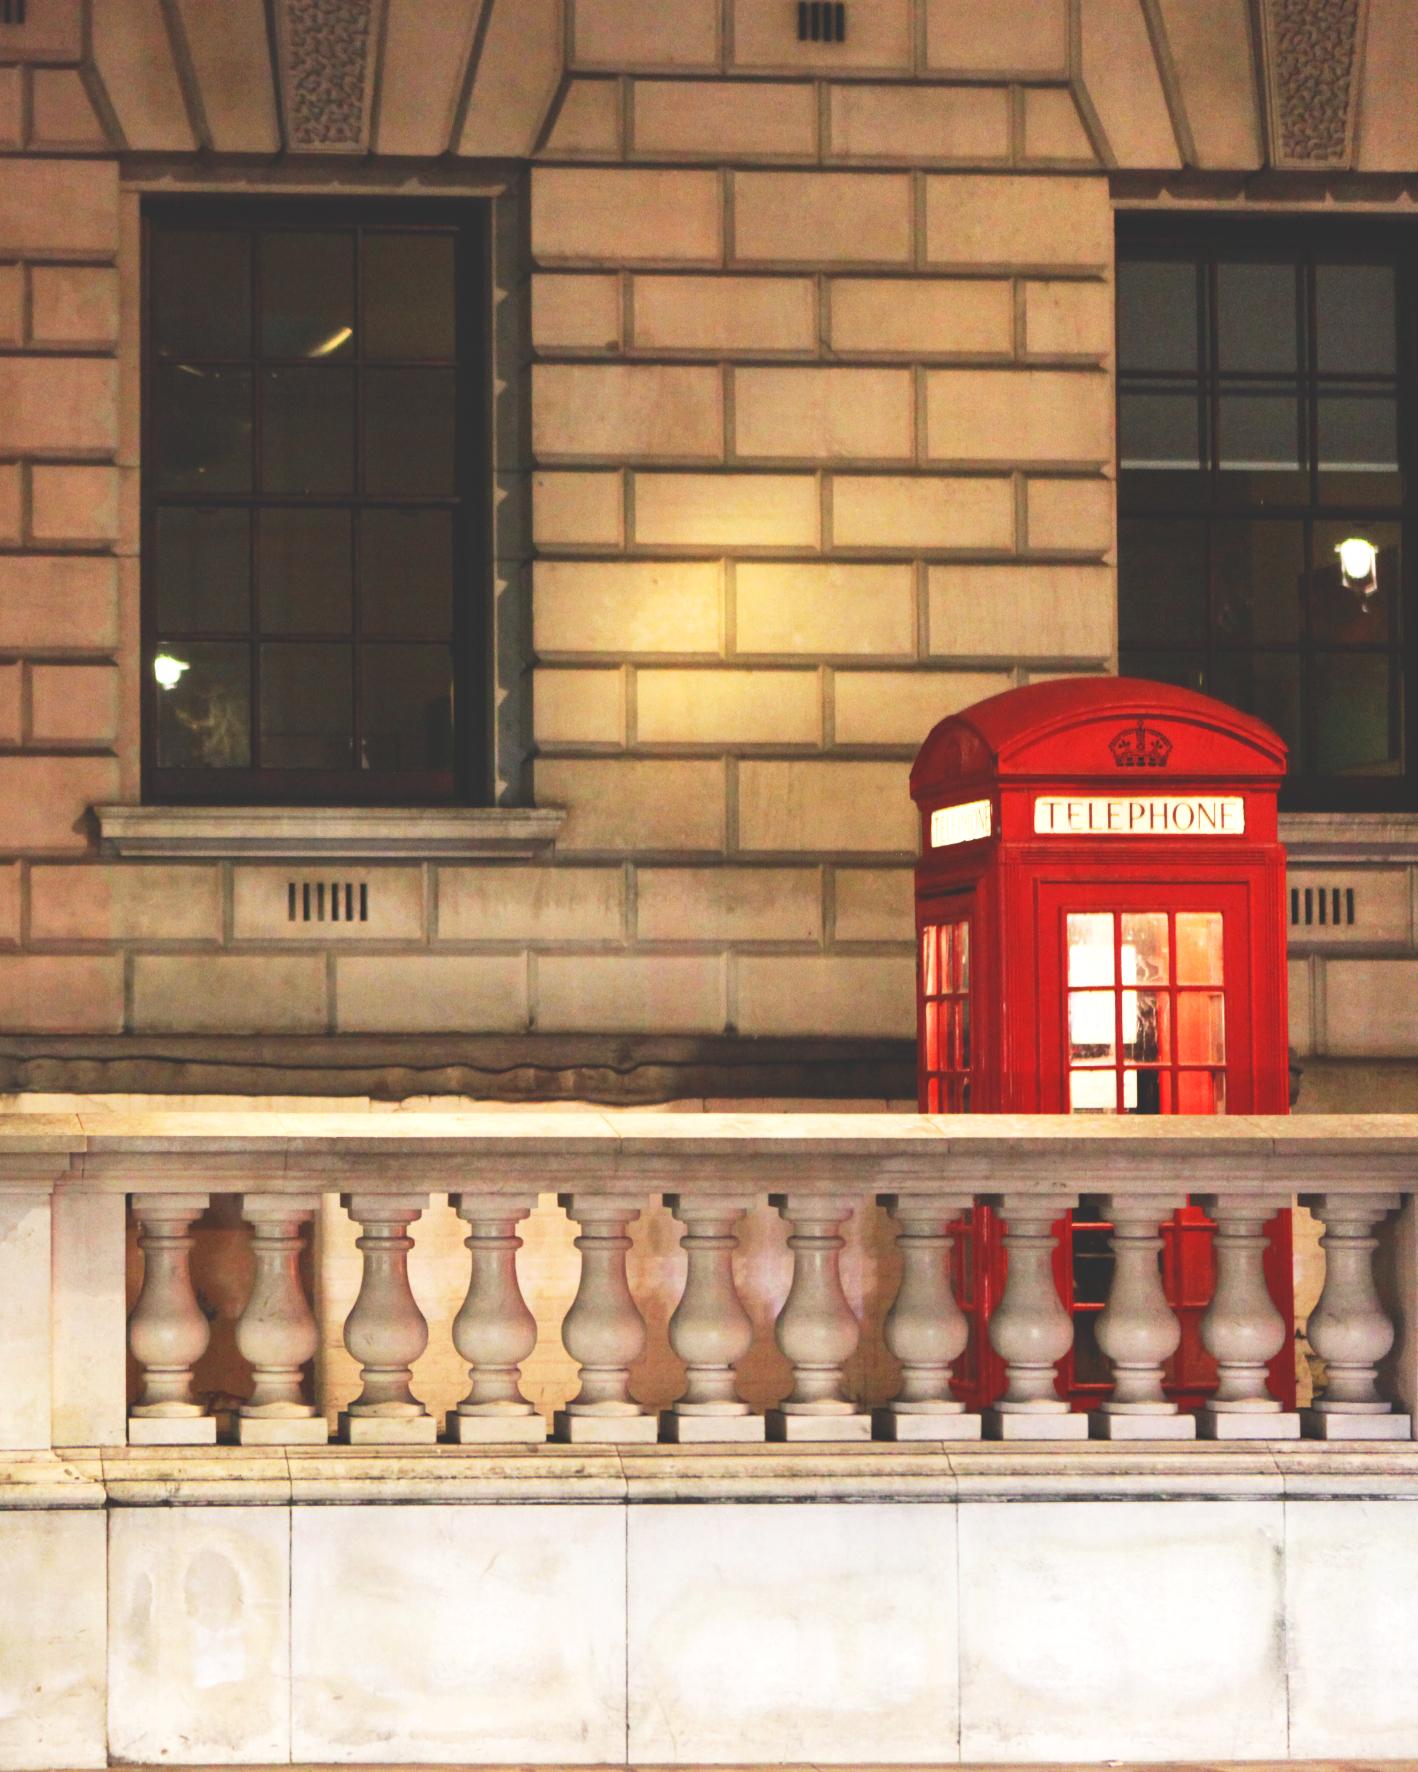 6-HOURS-IN-LONDON.jpg